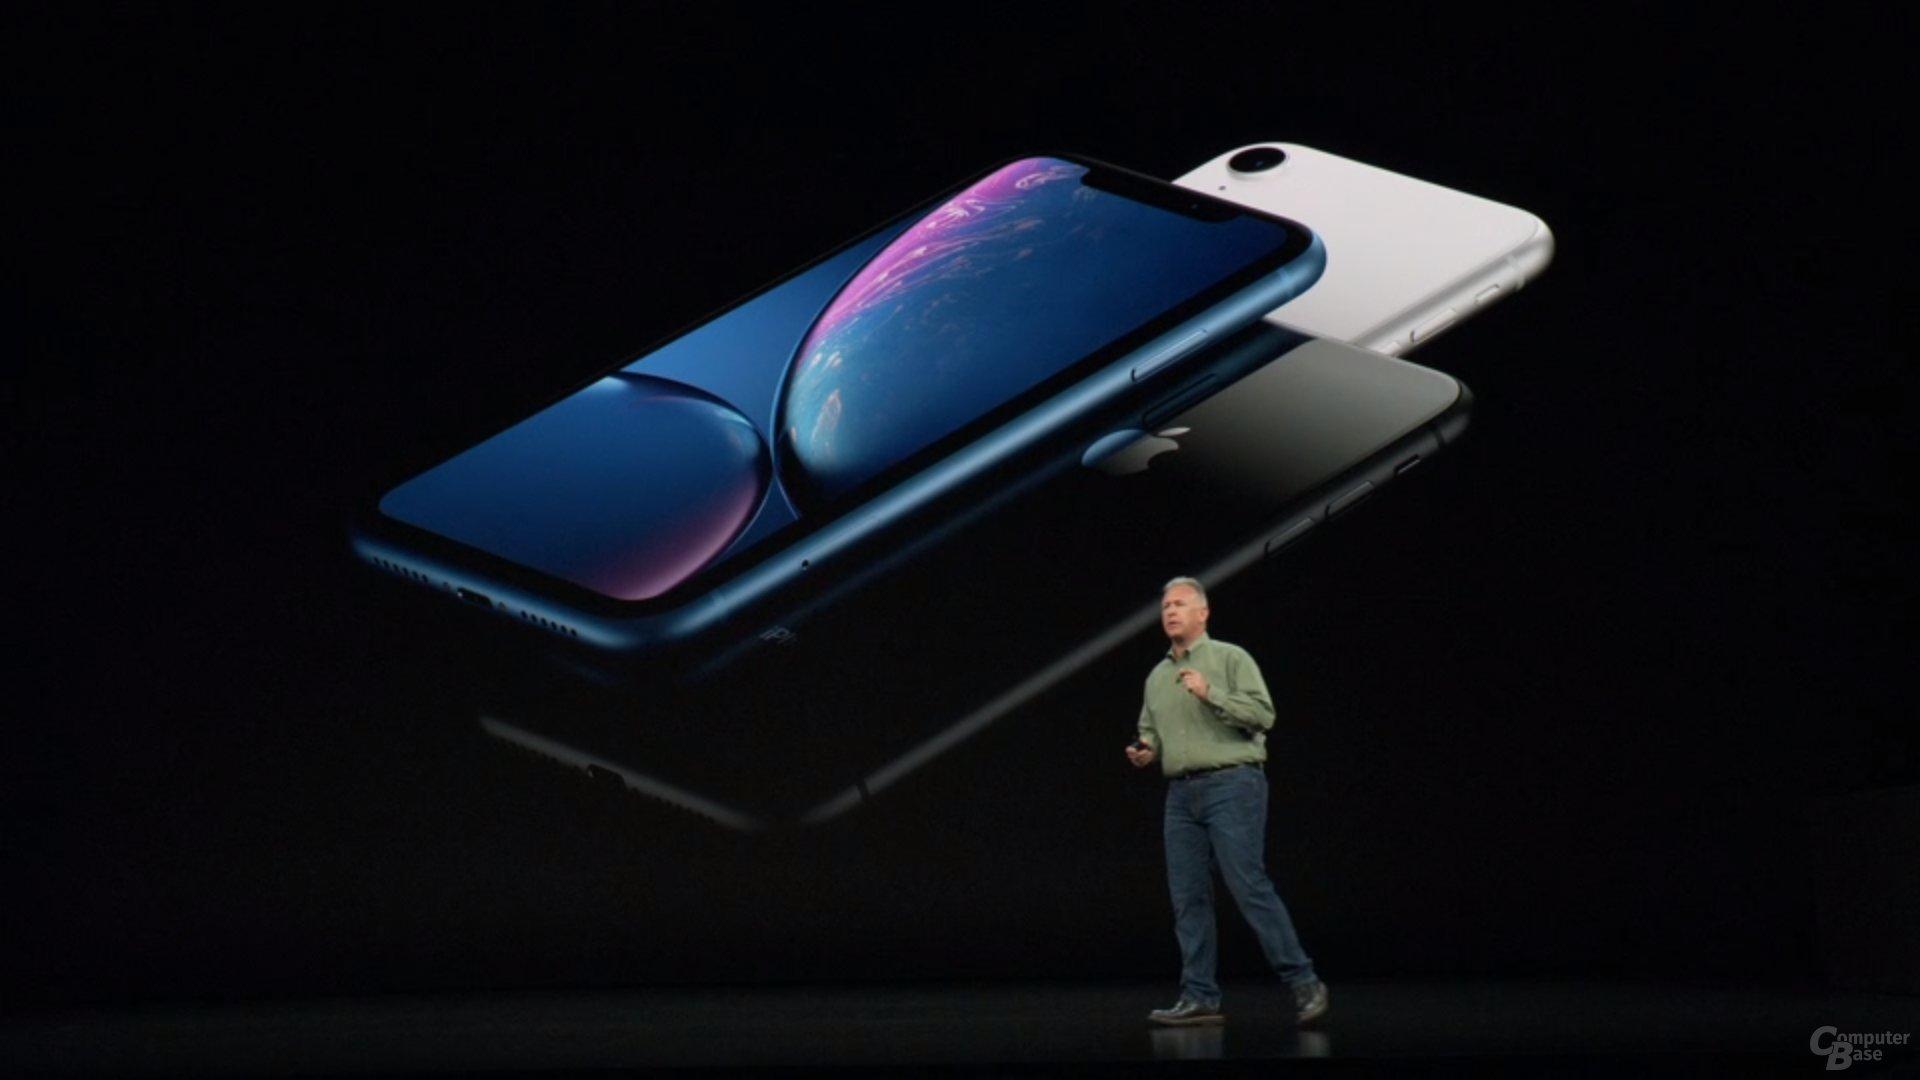 Apple iPhone Xr – Neue bunte Farben